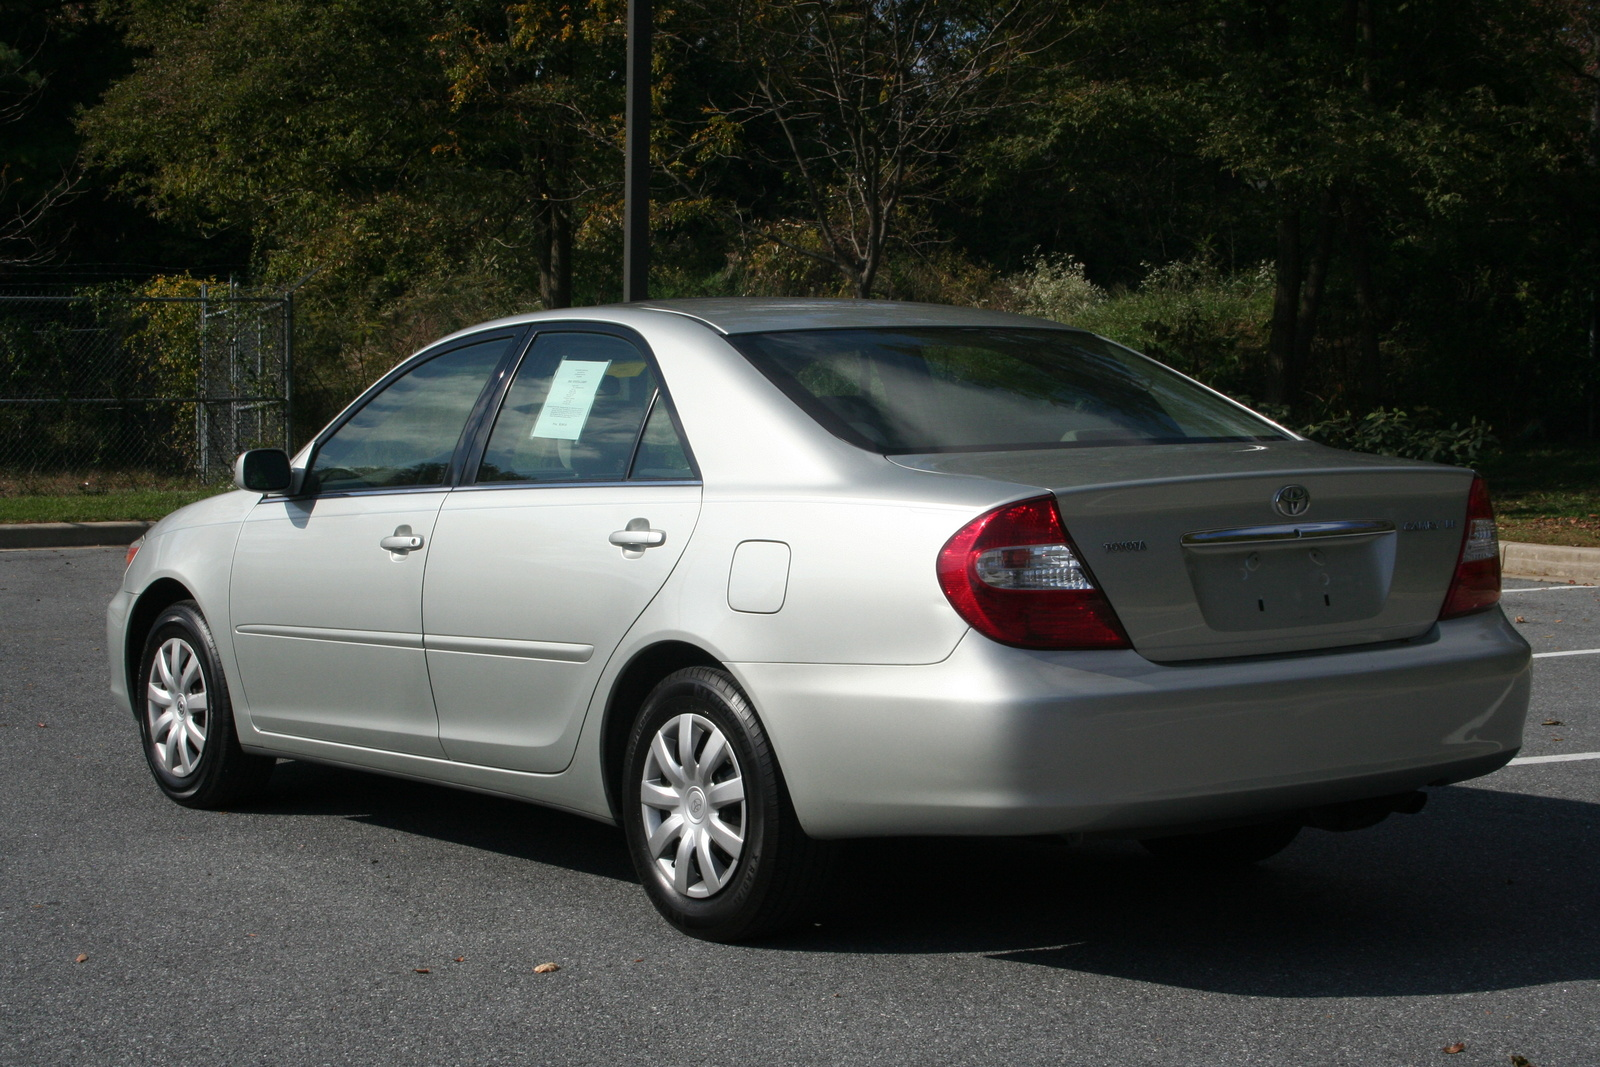 camry 2003 toyota cargurus le cars